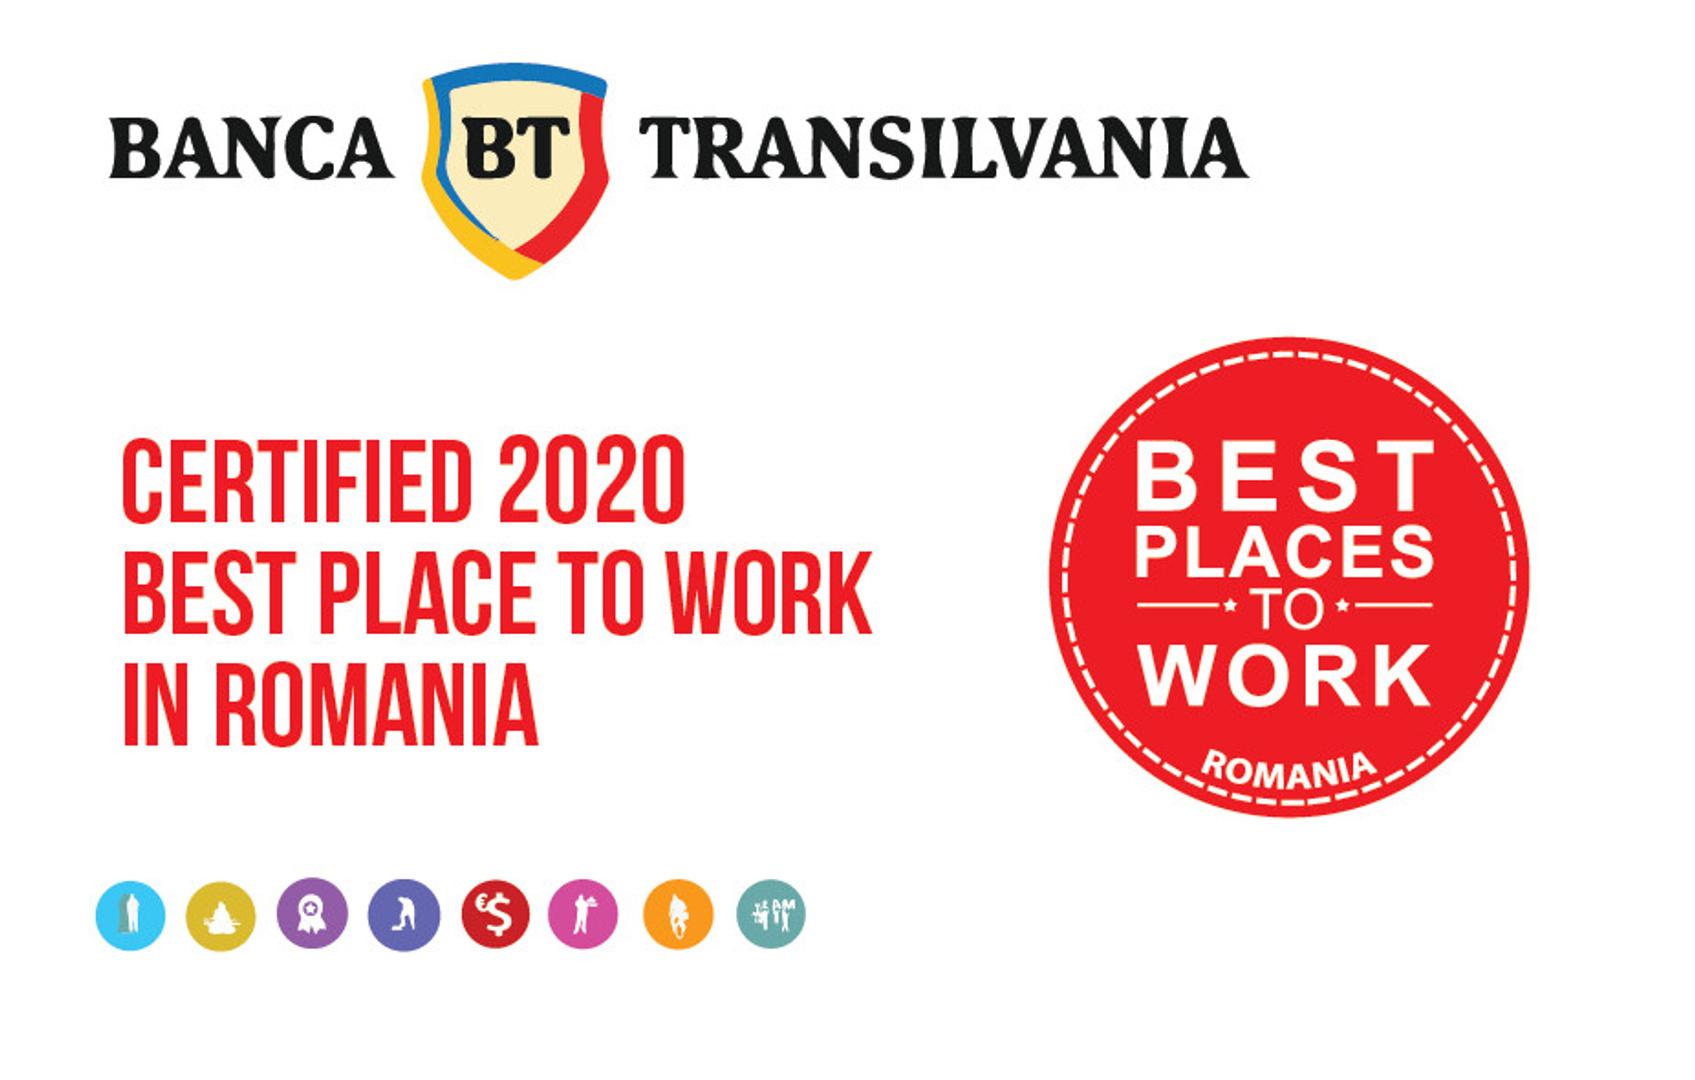 BPTW Romania Signature - Banca transaliviana romania 2020